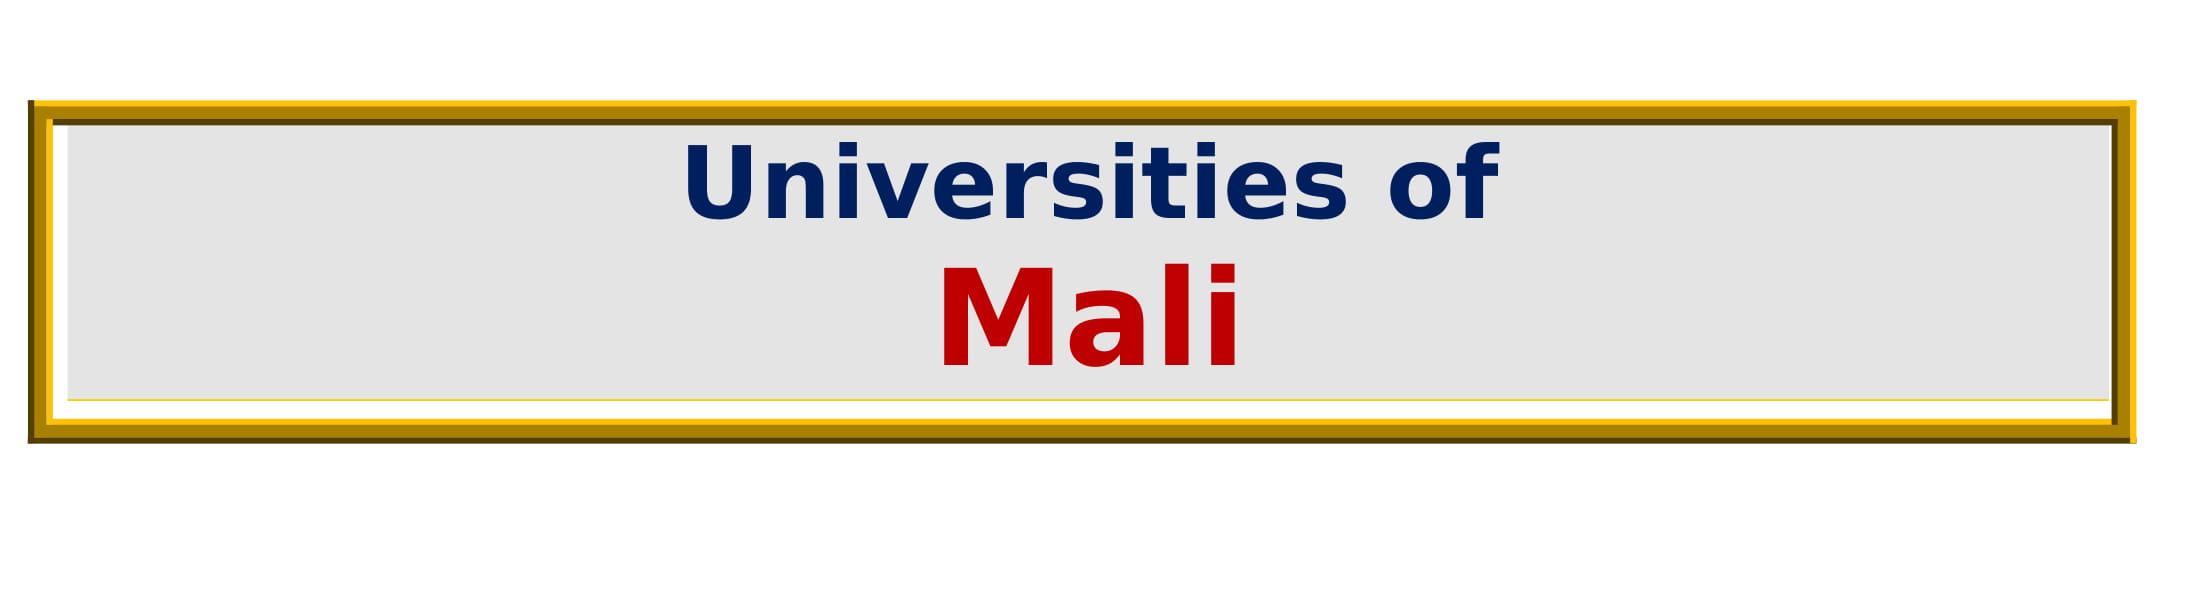 List of Universities in Mali